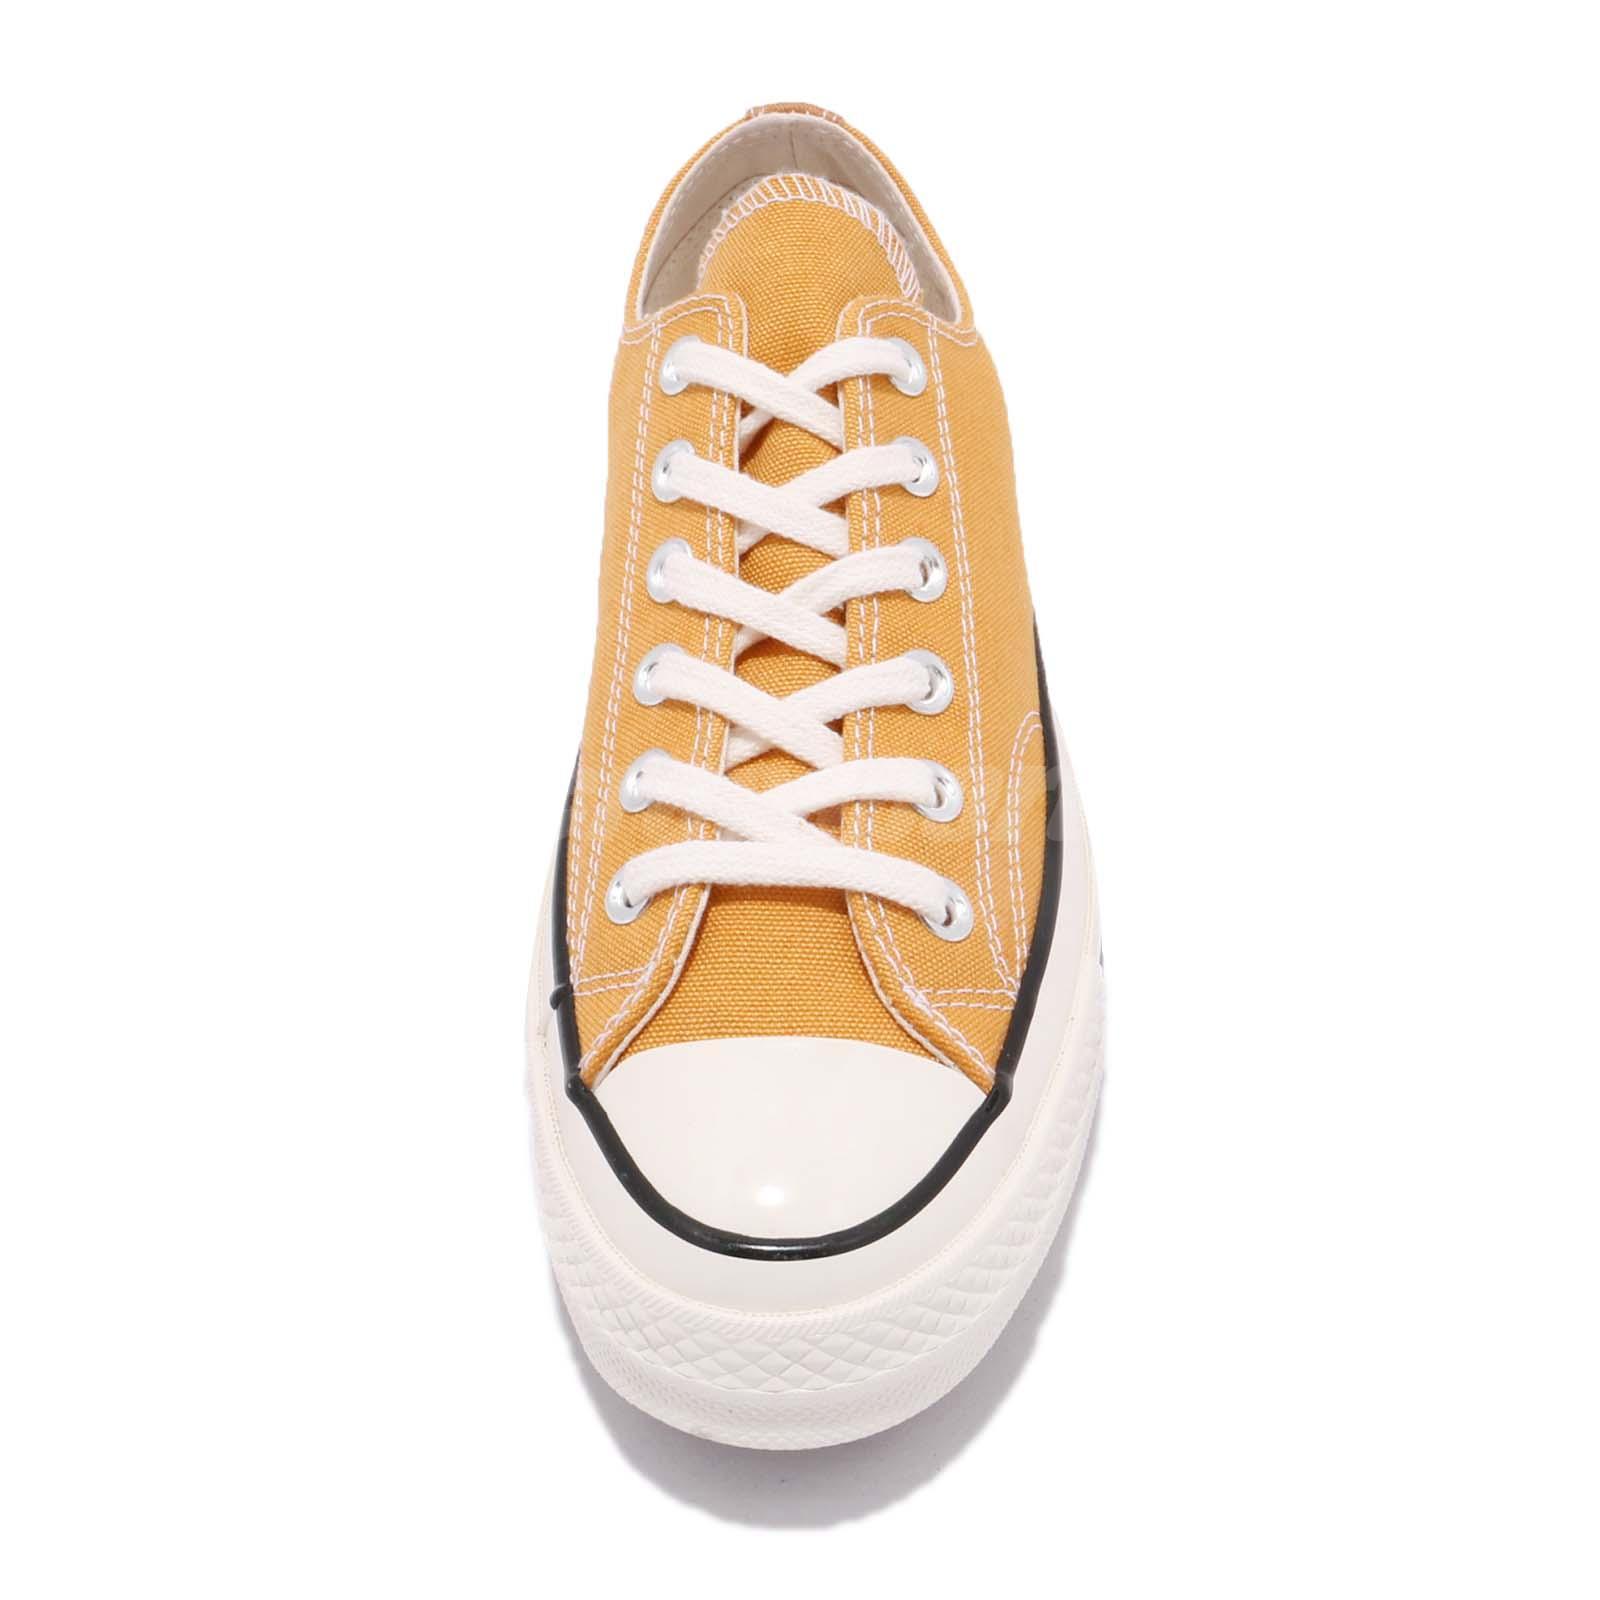 a3799a47fe92 Converse First String Chuck Taylor All Star 1970s Yellow Men Women ...